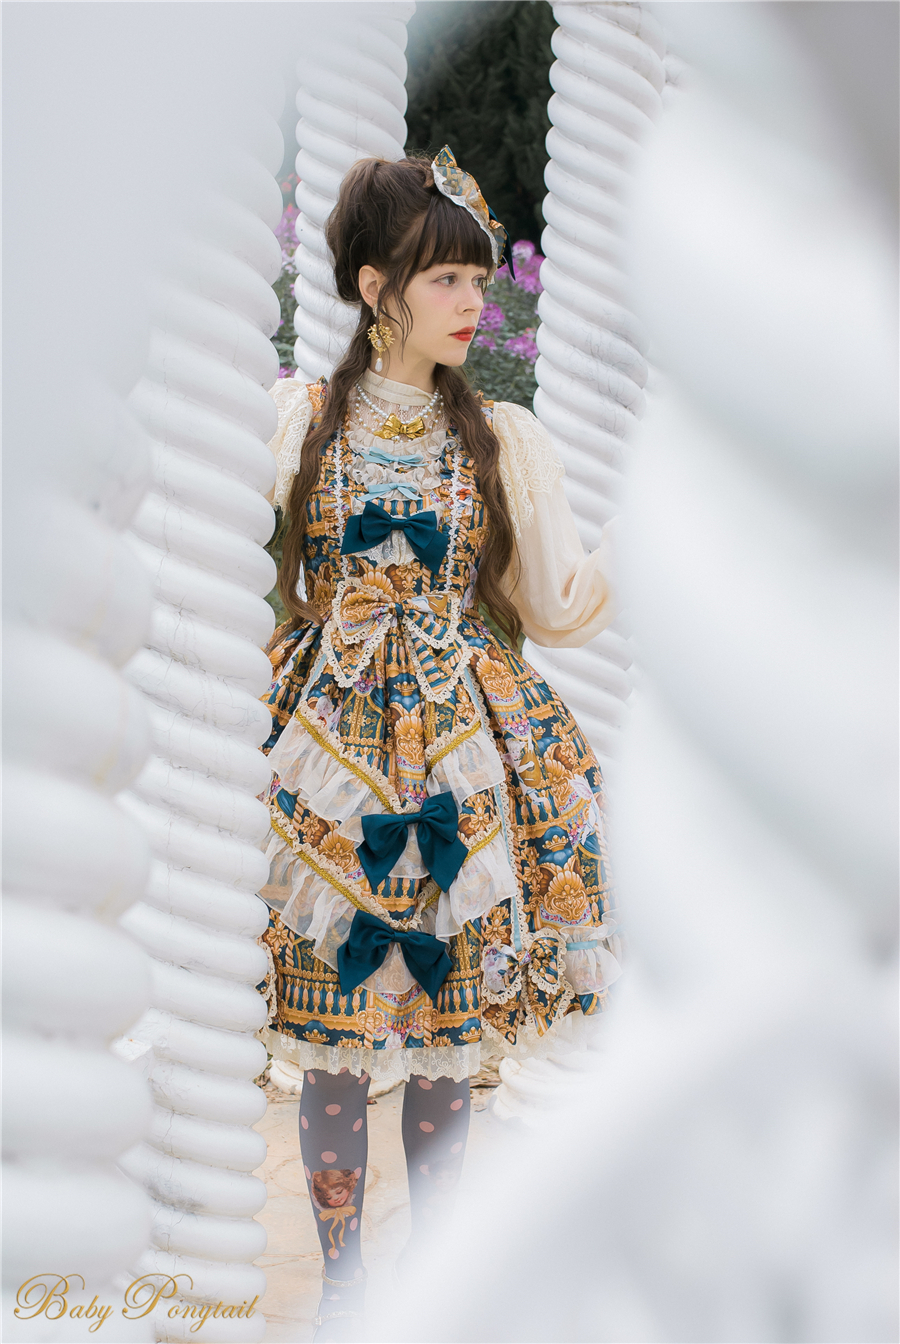 Babyponytail_Model_JSK_Tiel Present Angel_Claudia_2_01.jpg